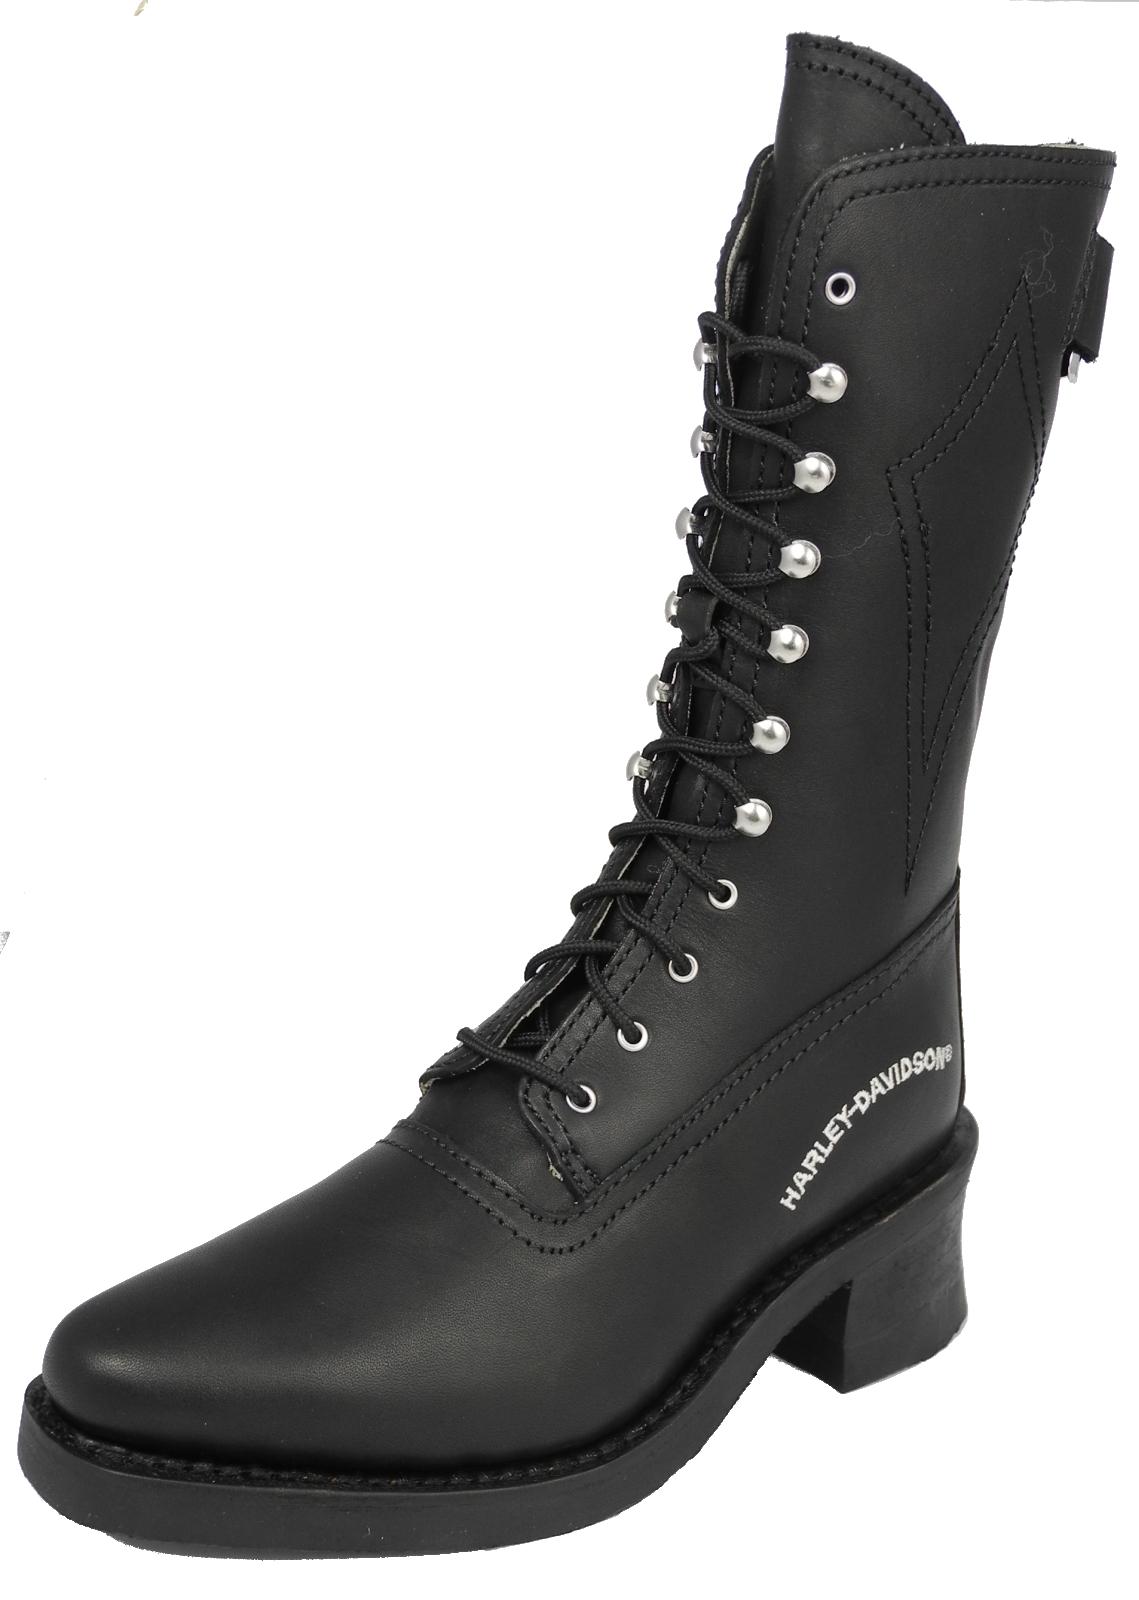 Cool   Harley Davidson Vada Black Womens Cowboy Biker Boots Size 9 Shoes